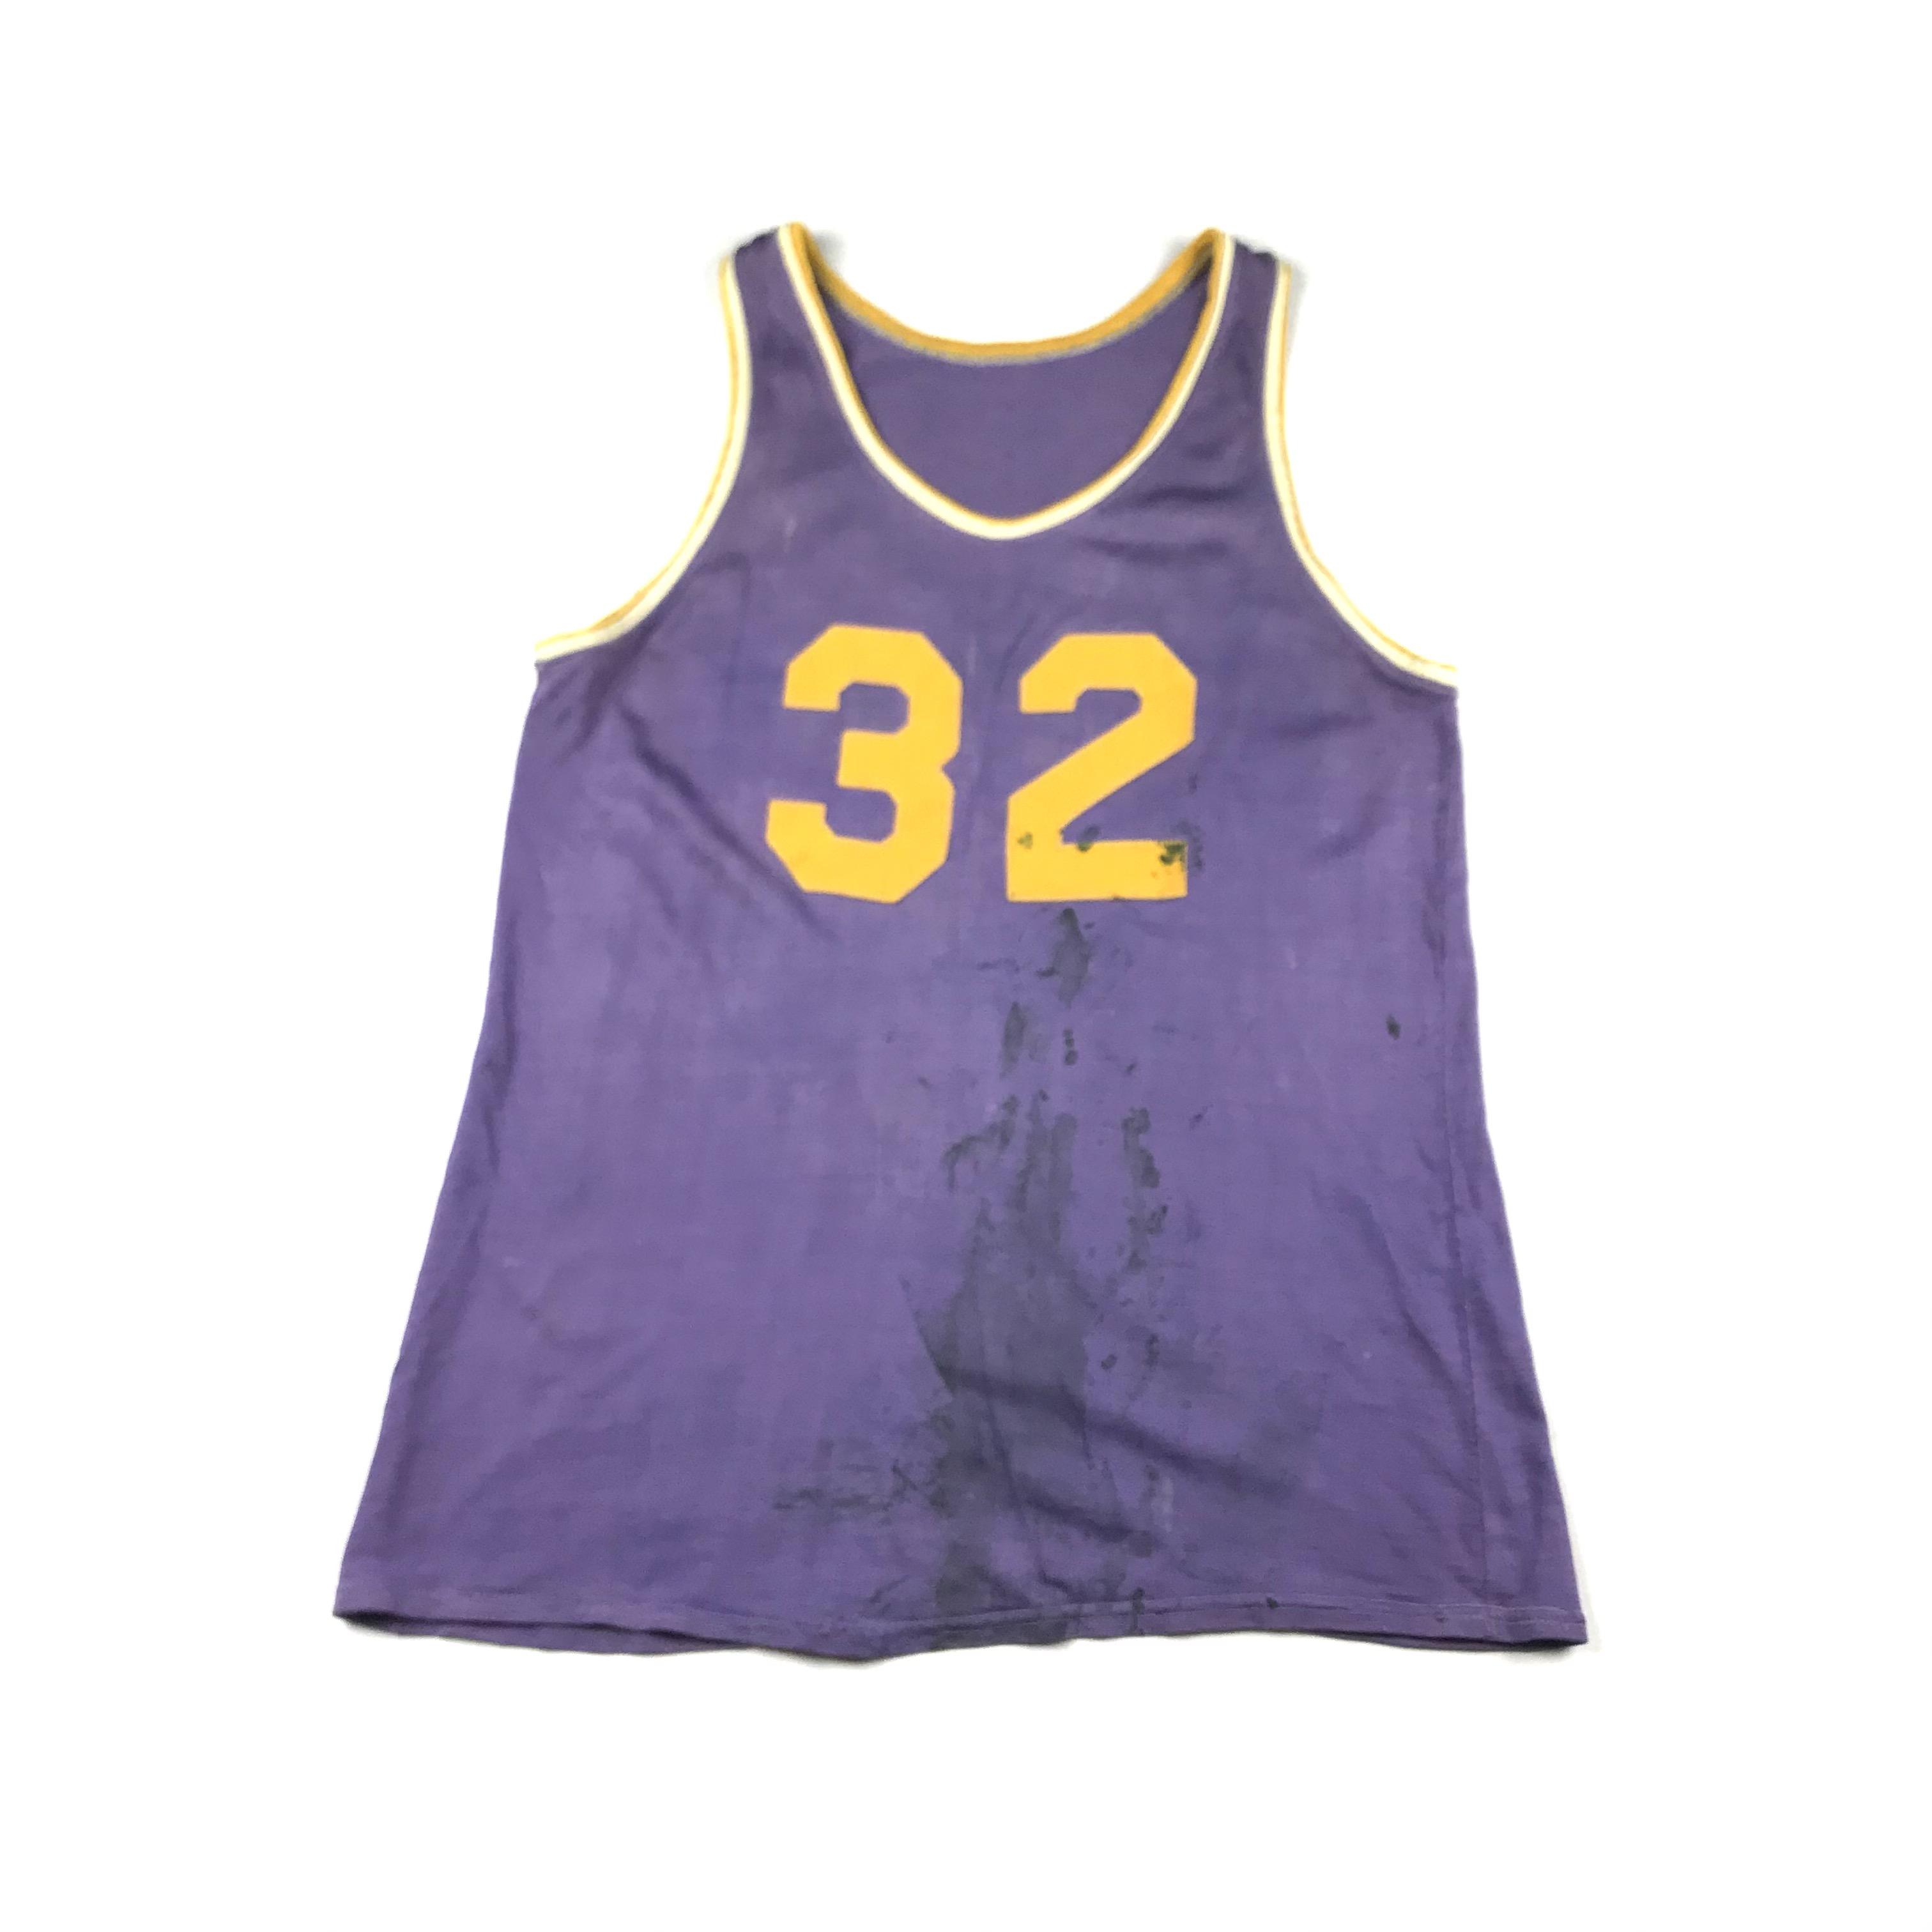 Vintage Vintage 70s/80s Minnesota Lakers #32 Basketball Jersey